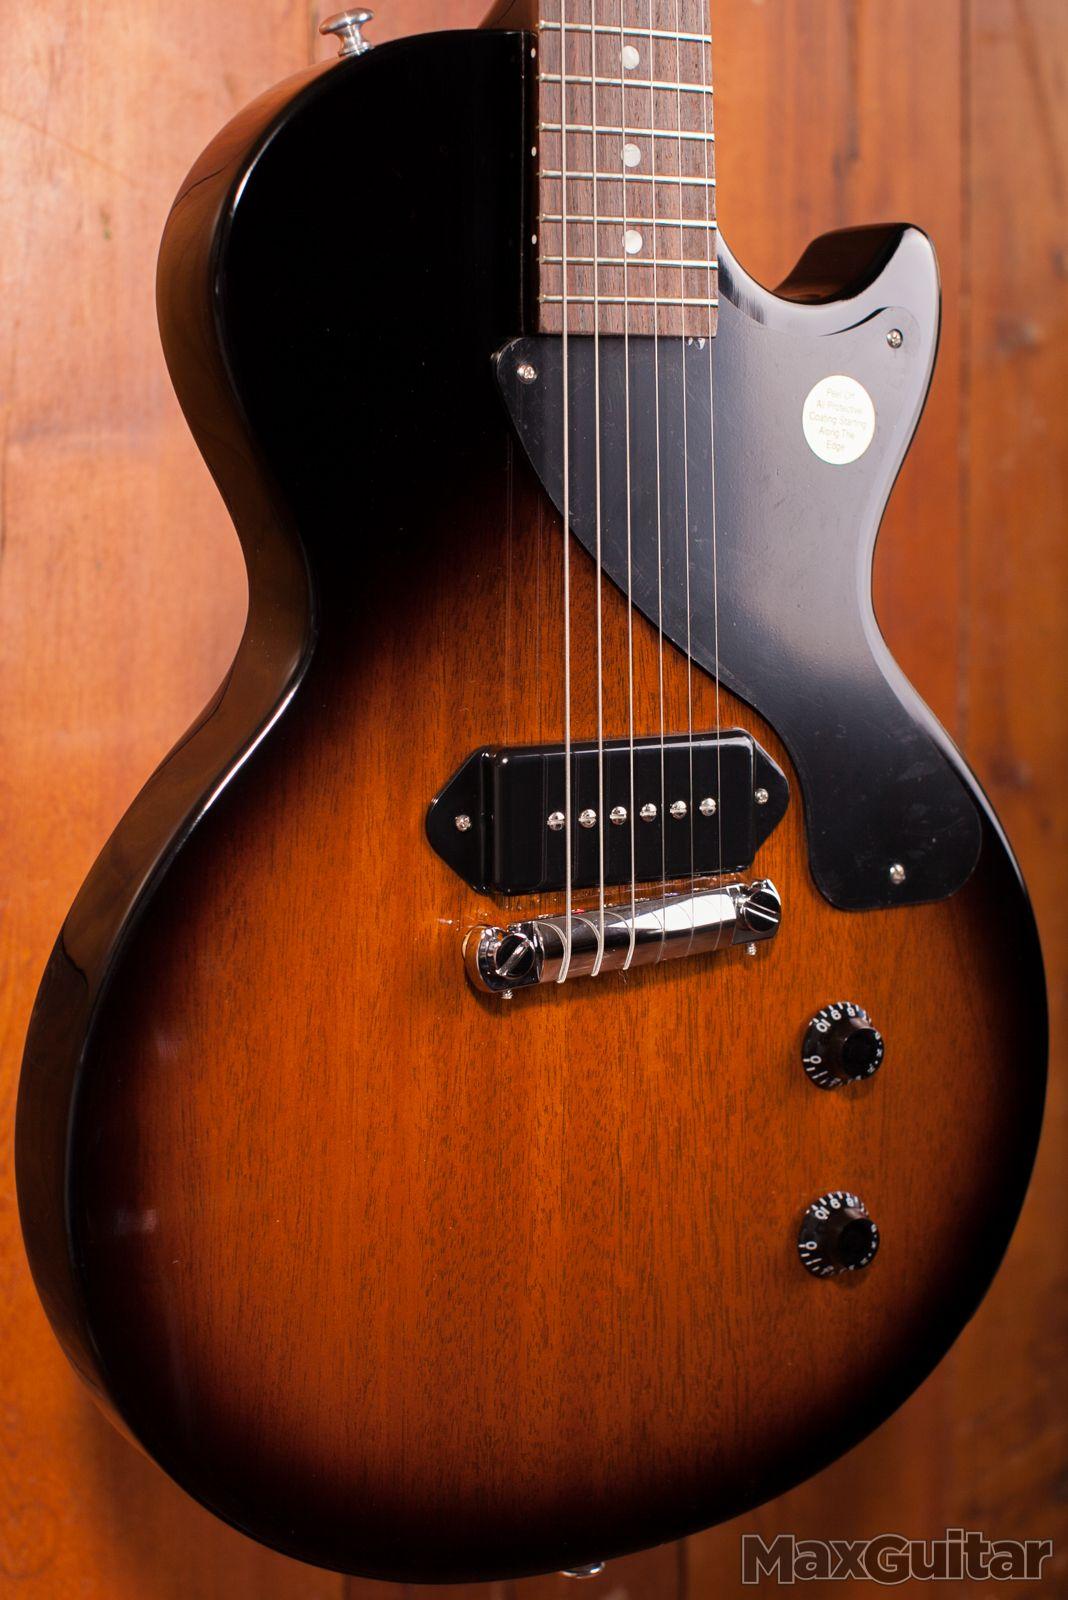 Custom Tabak Sunburst Junior Electric Guitar Single Cutaway, Black P90 Pickup, Vintage Tuner